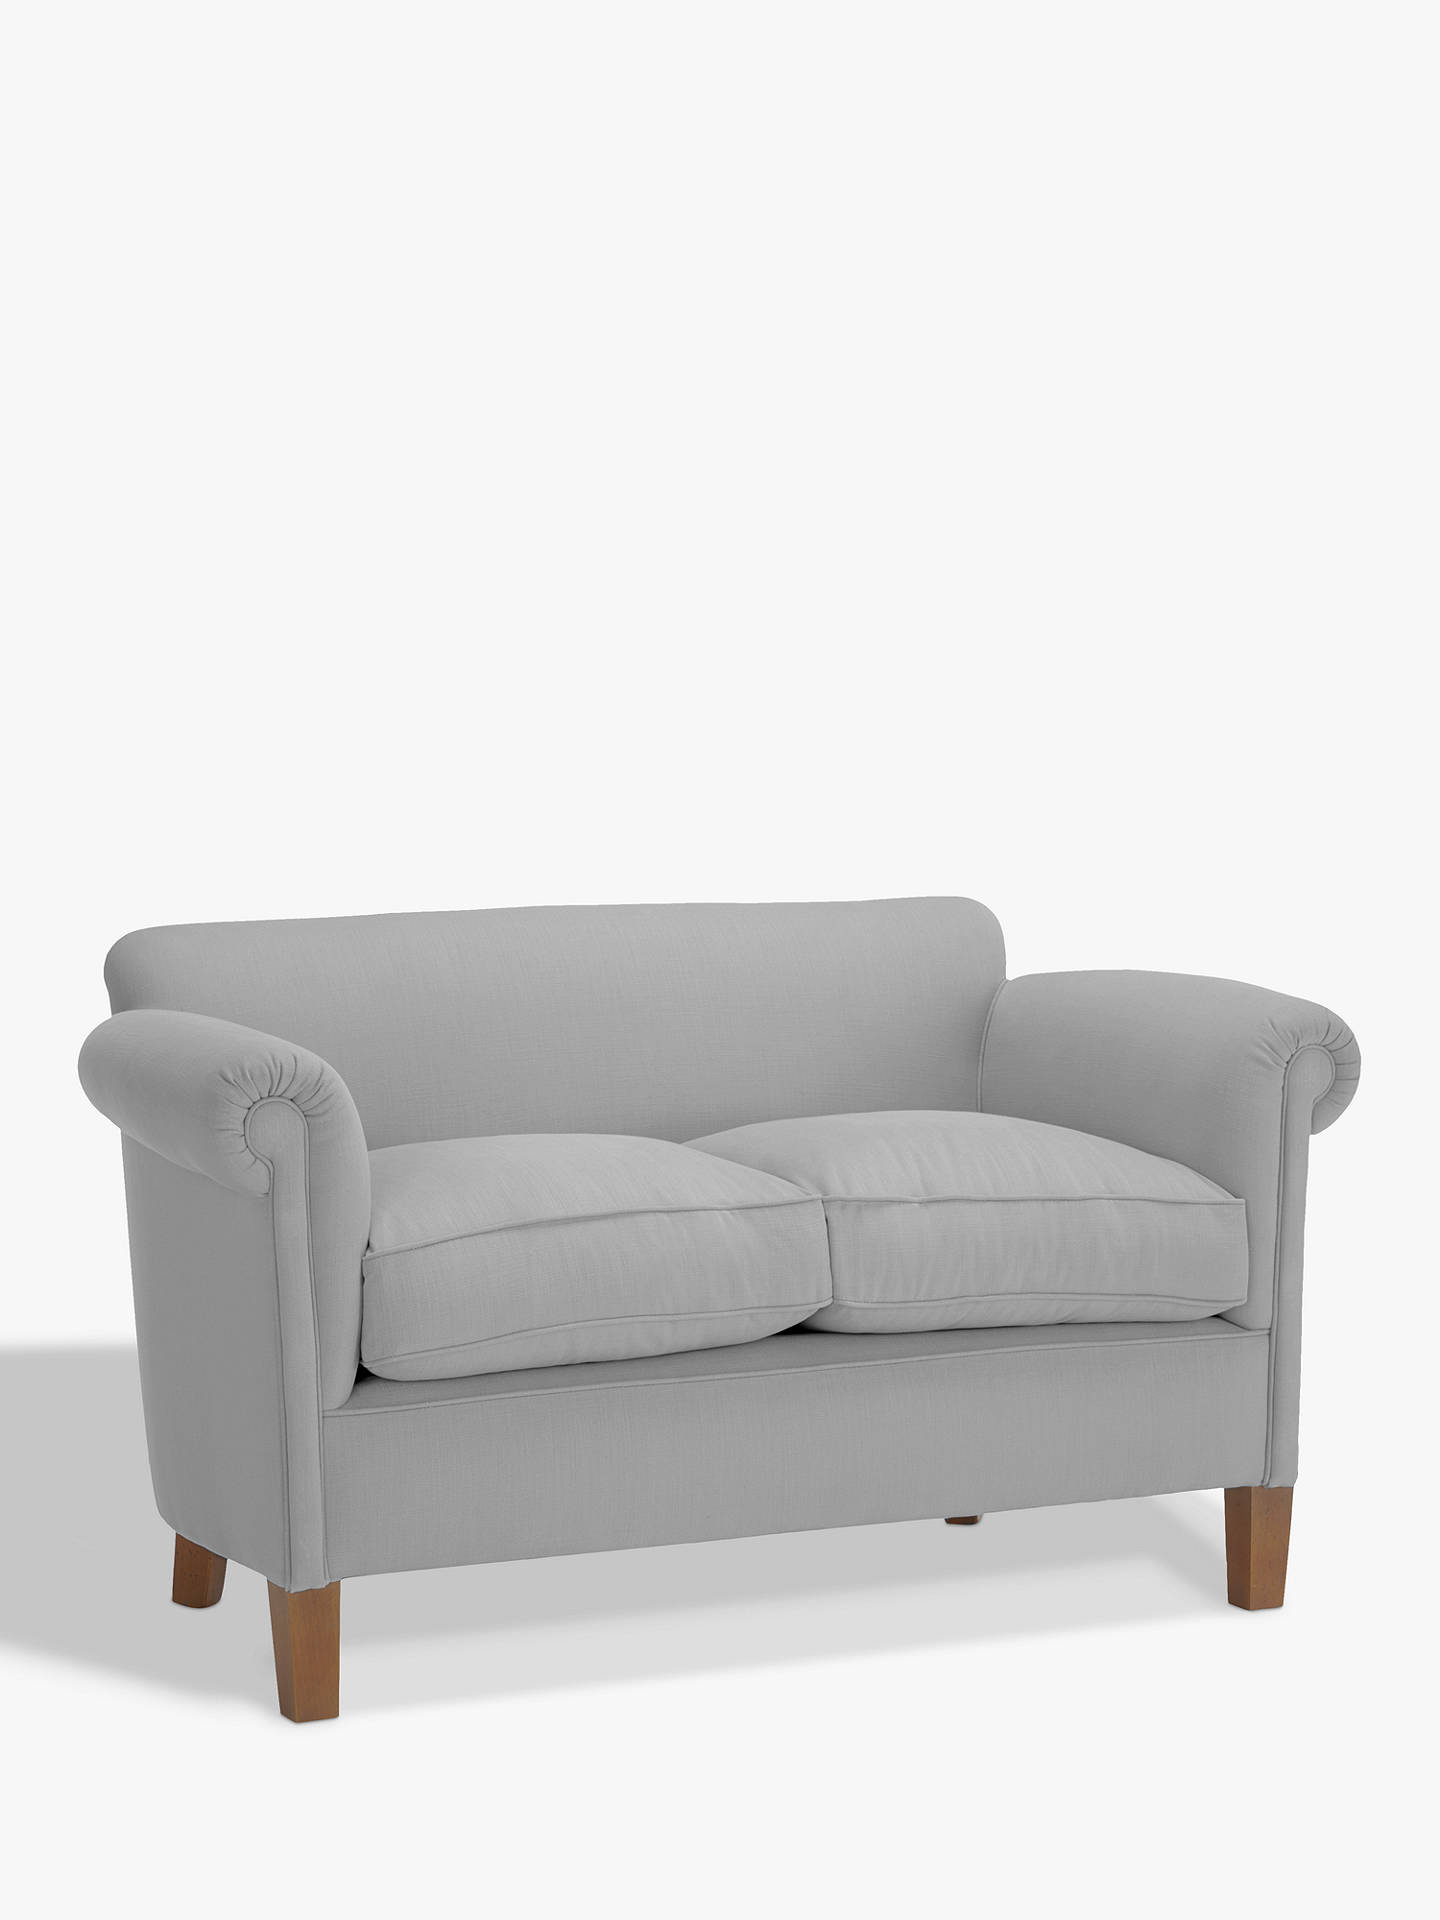 john lewis partners camford petite sofa at john lewis. Black Bedroom Furniture Sets. Home Design Ideas